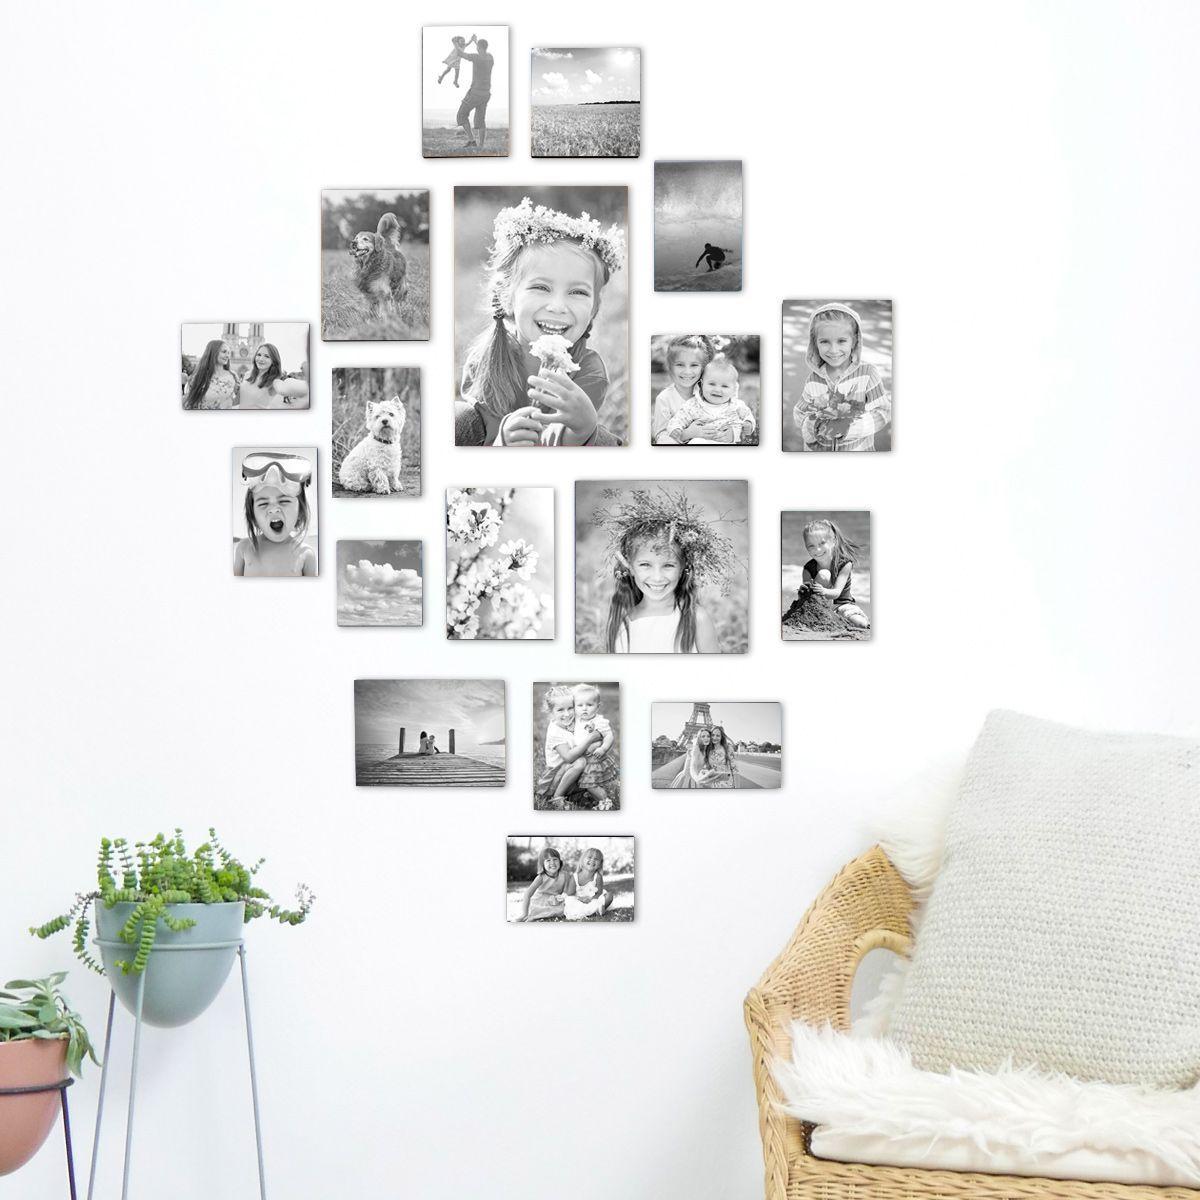 Einzigartige Fotowand Ideen Mit Bilderrahmen Kreativliste Fotowand Ideen Fotowand Bilderrahmen